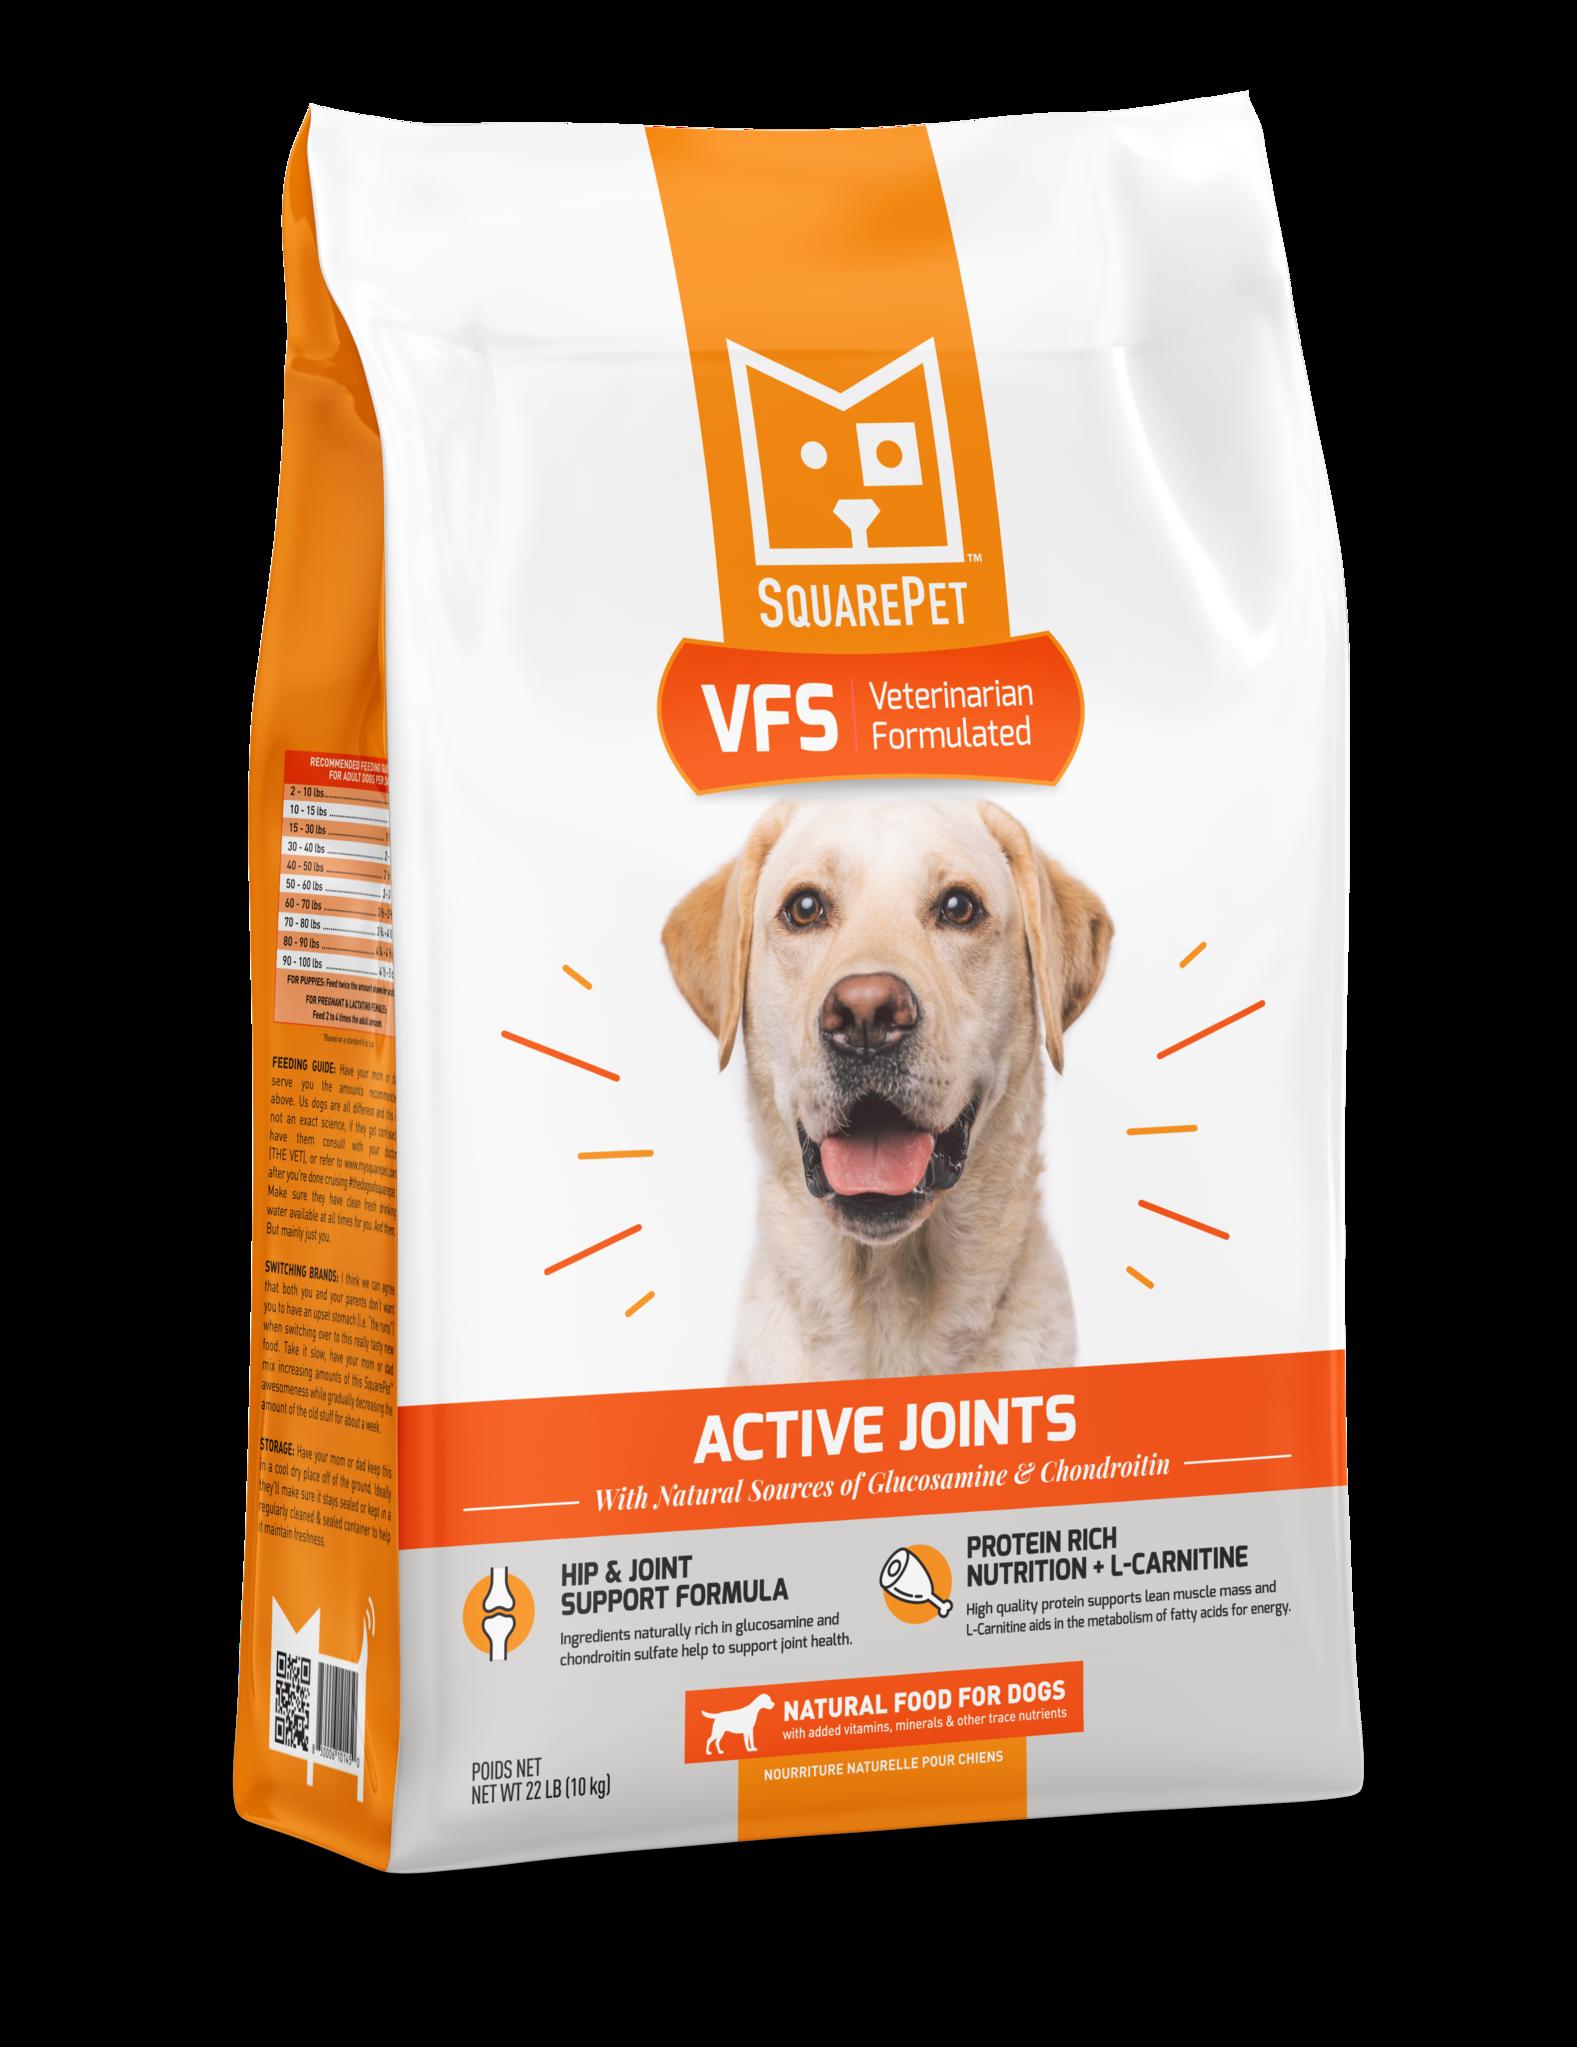 SquarePet VFS Active Joints Dry Dog Food, 22-lb